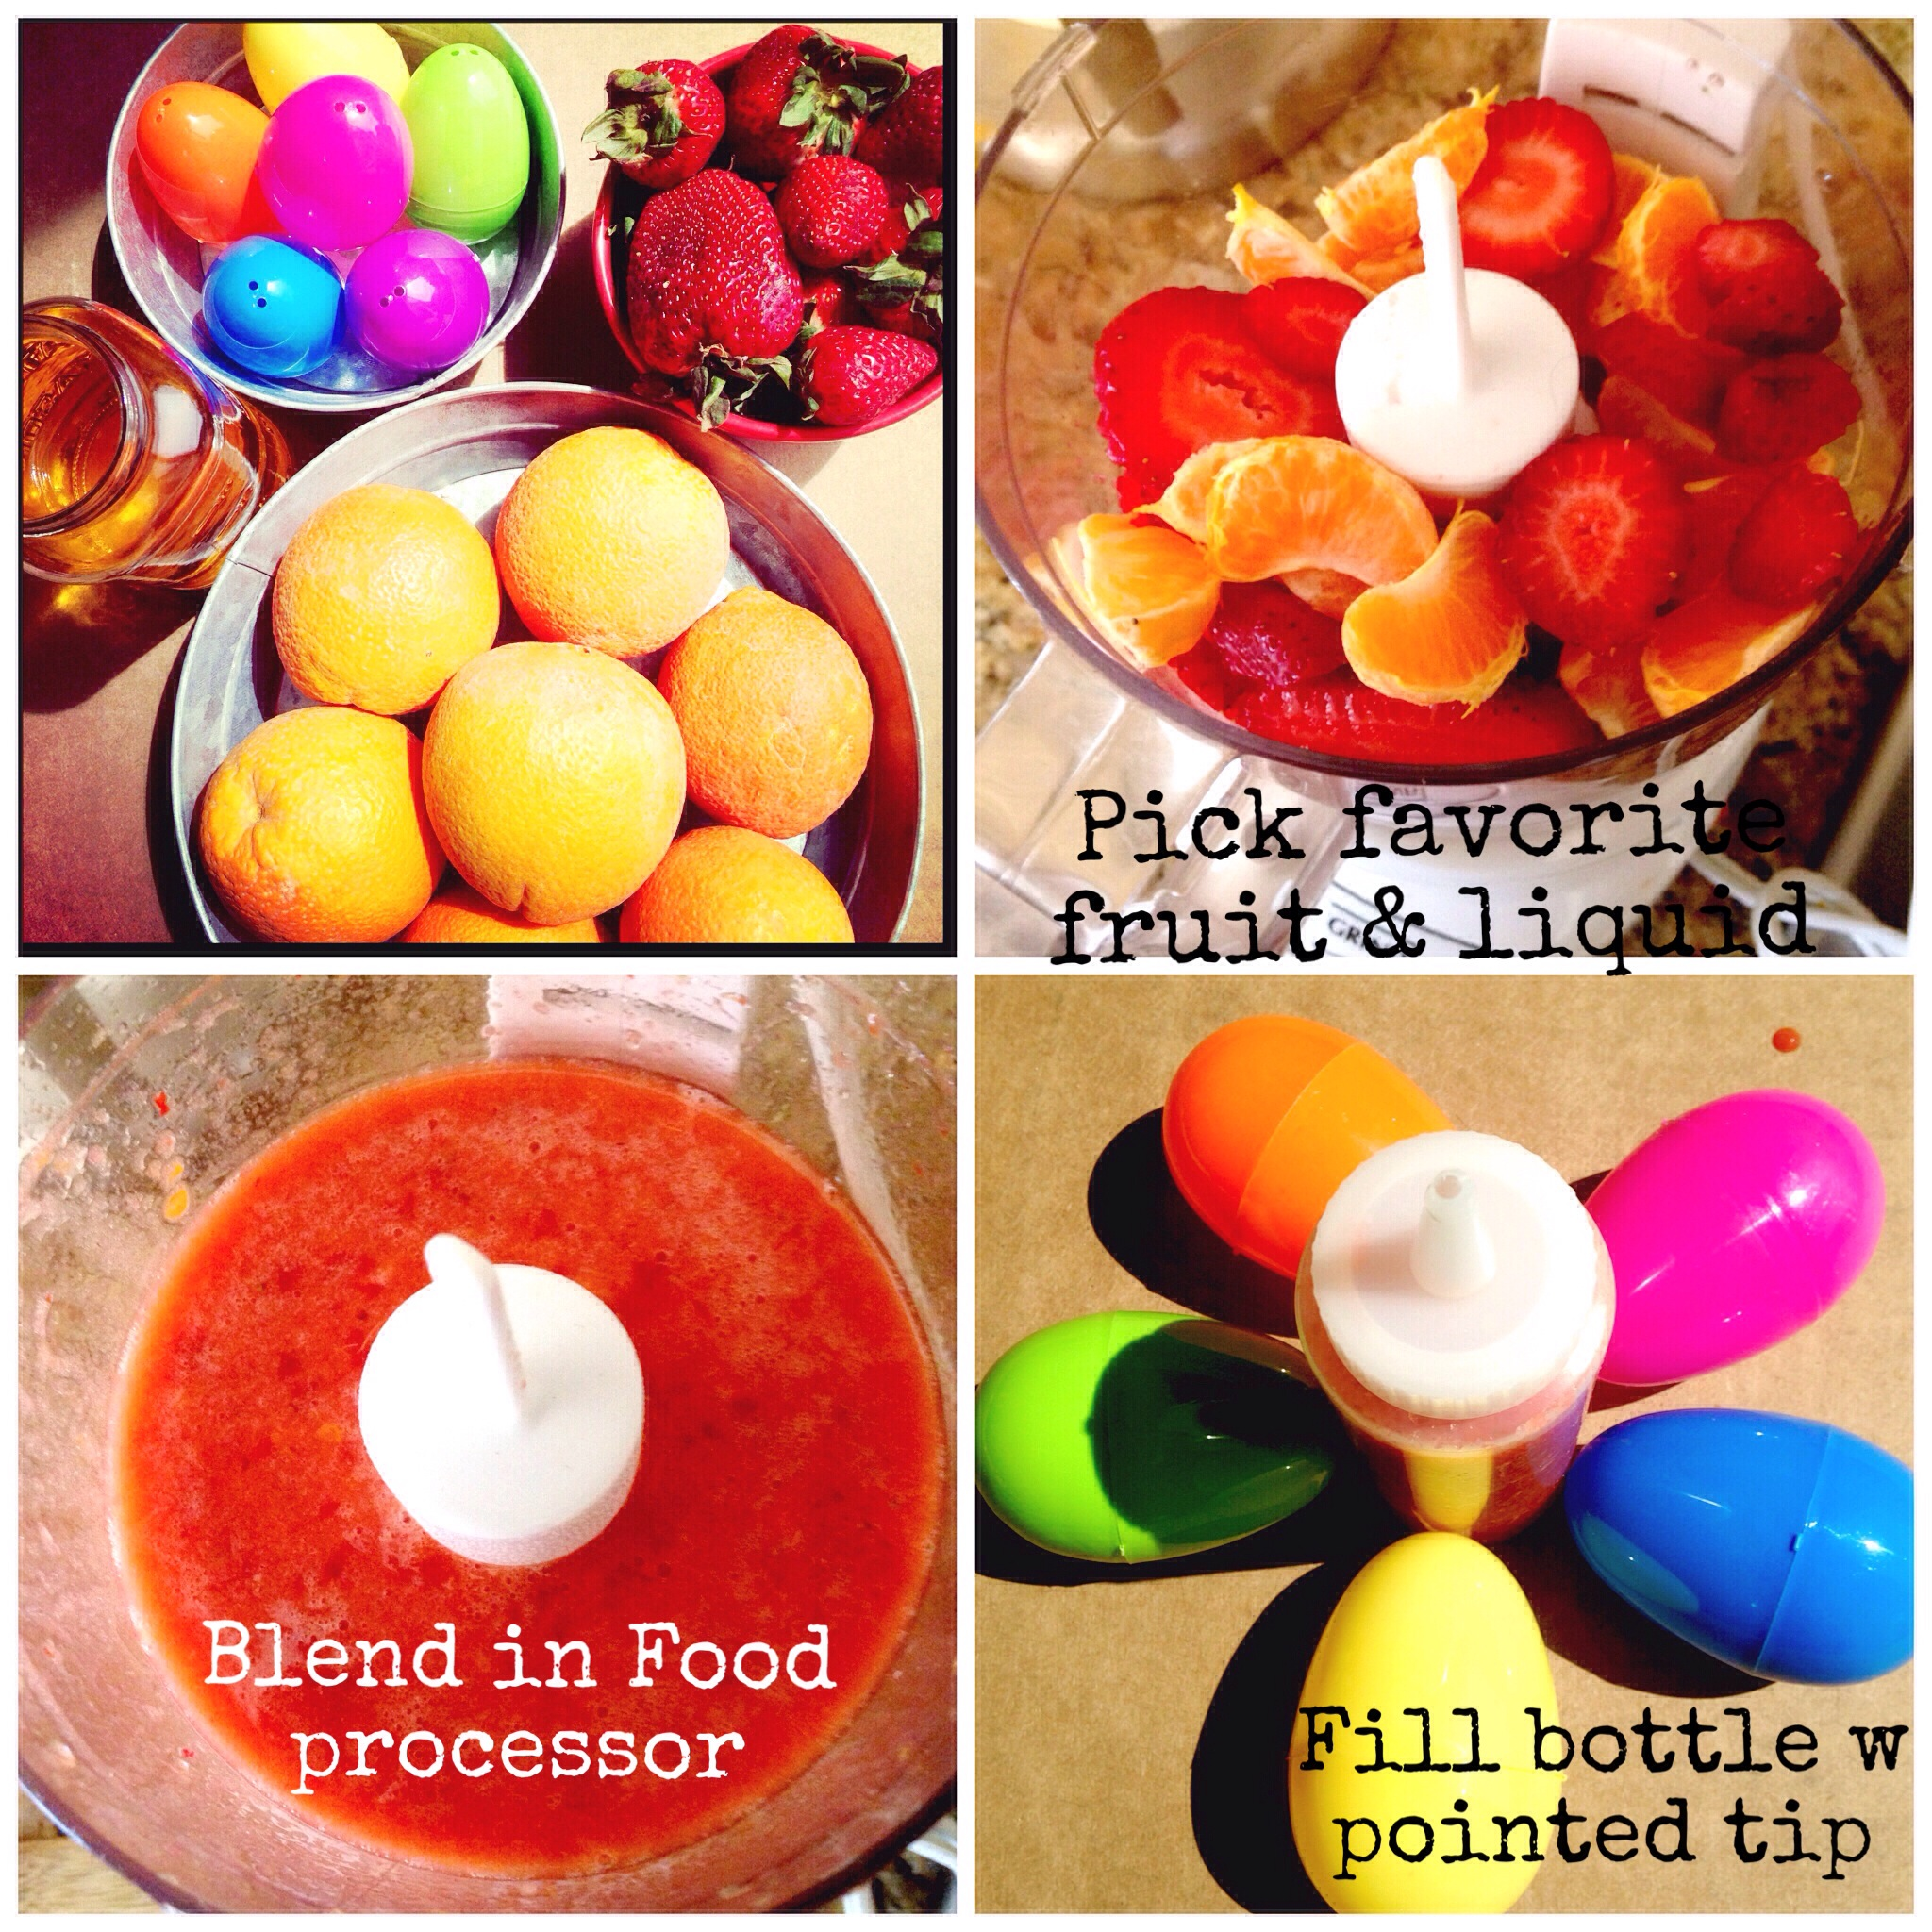 1. Blend Fruit & Juice 2. Fill piping bottle 3. fill washed egg 4. Put in freezer to set 5. Enjoy!